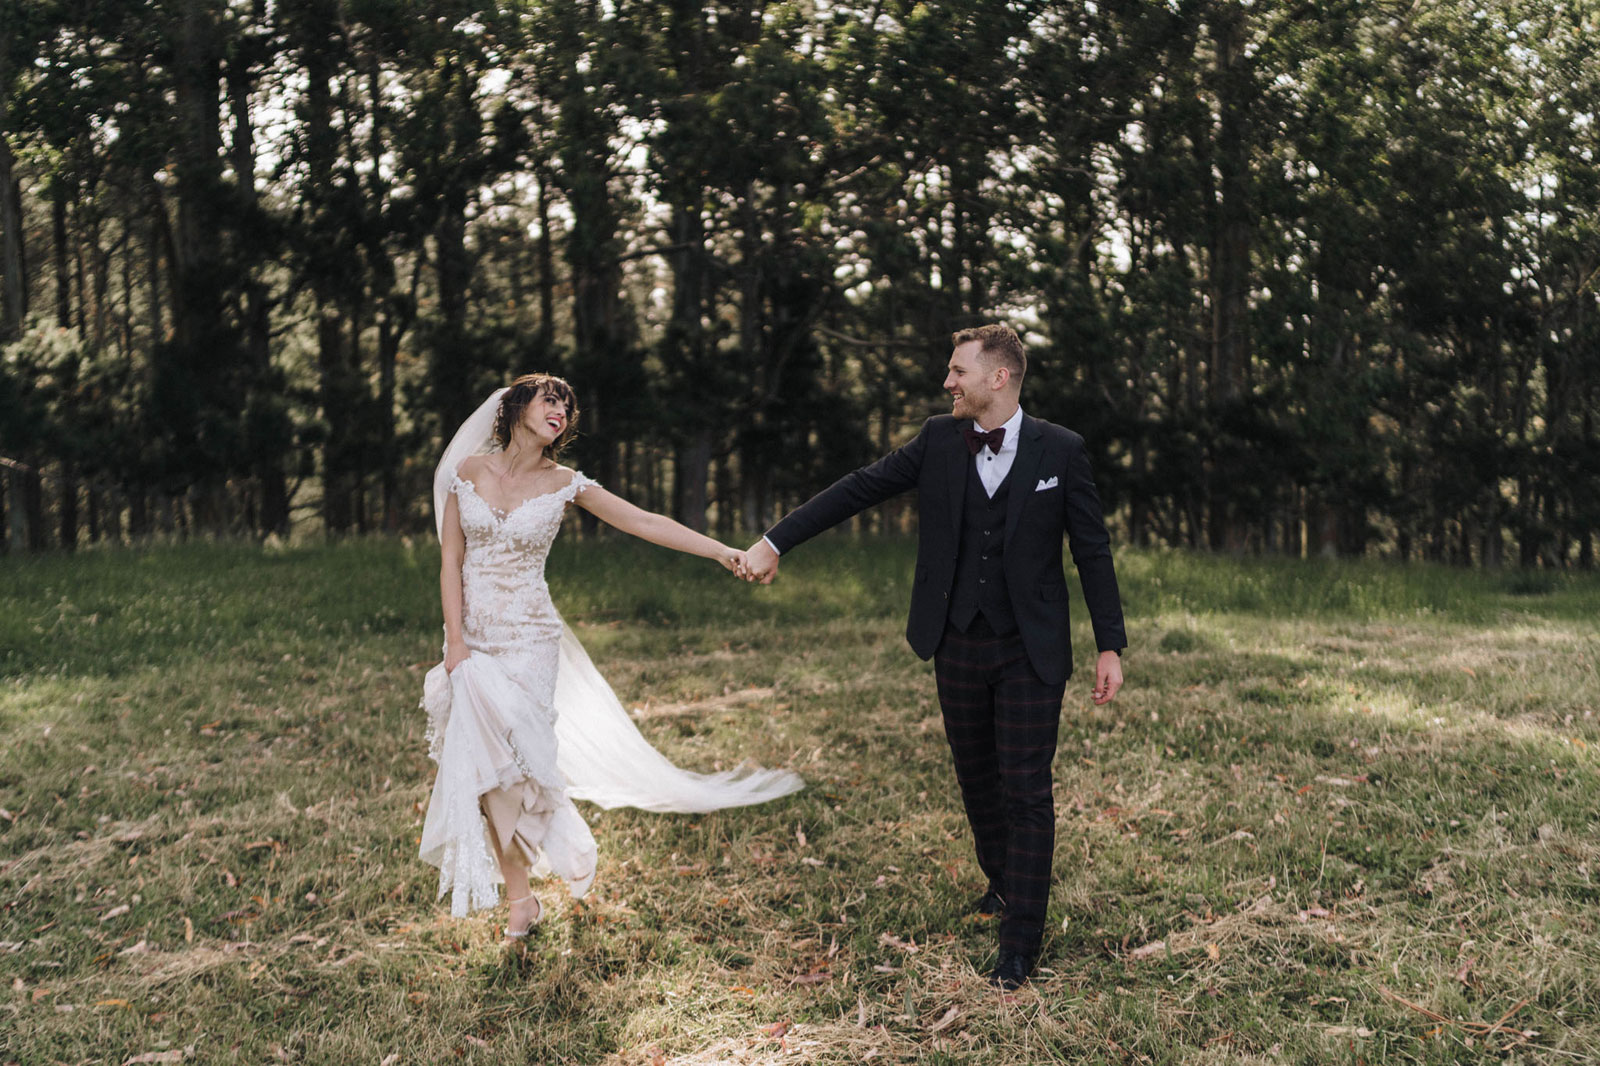 newfound-n-c-olive-tree-cottage-tauranga-wedding-photographer-822